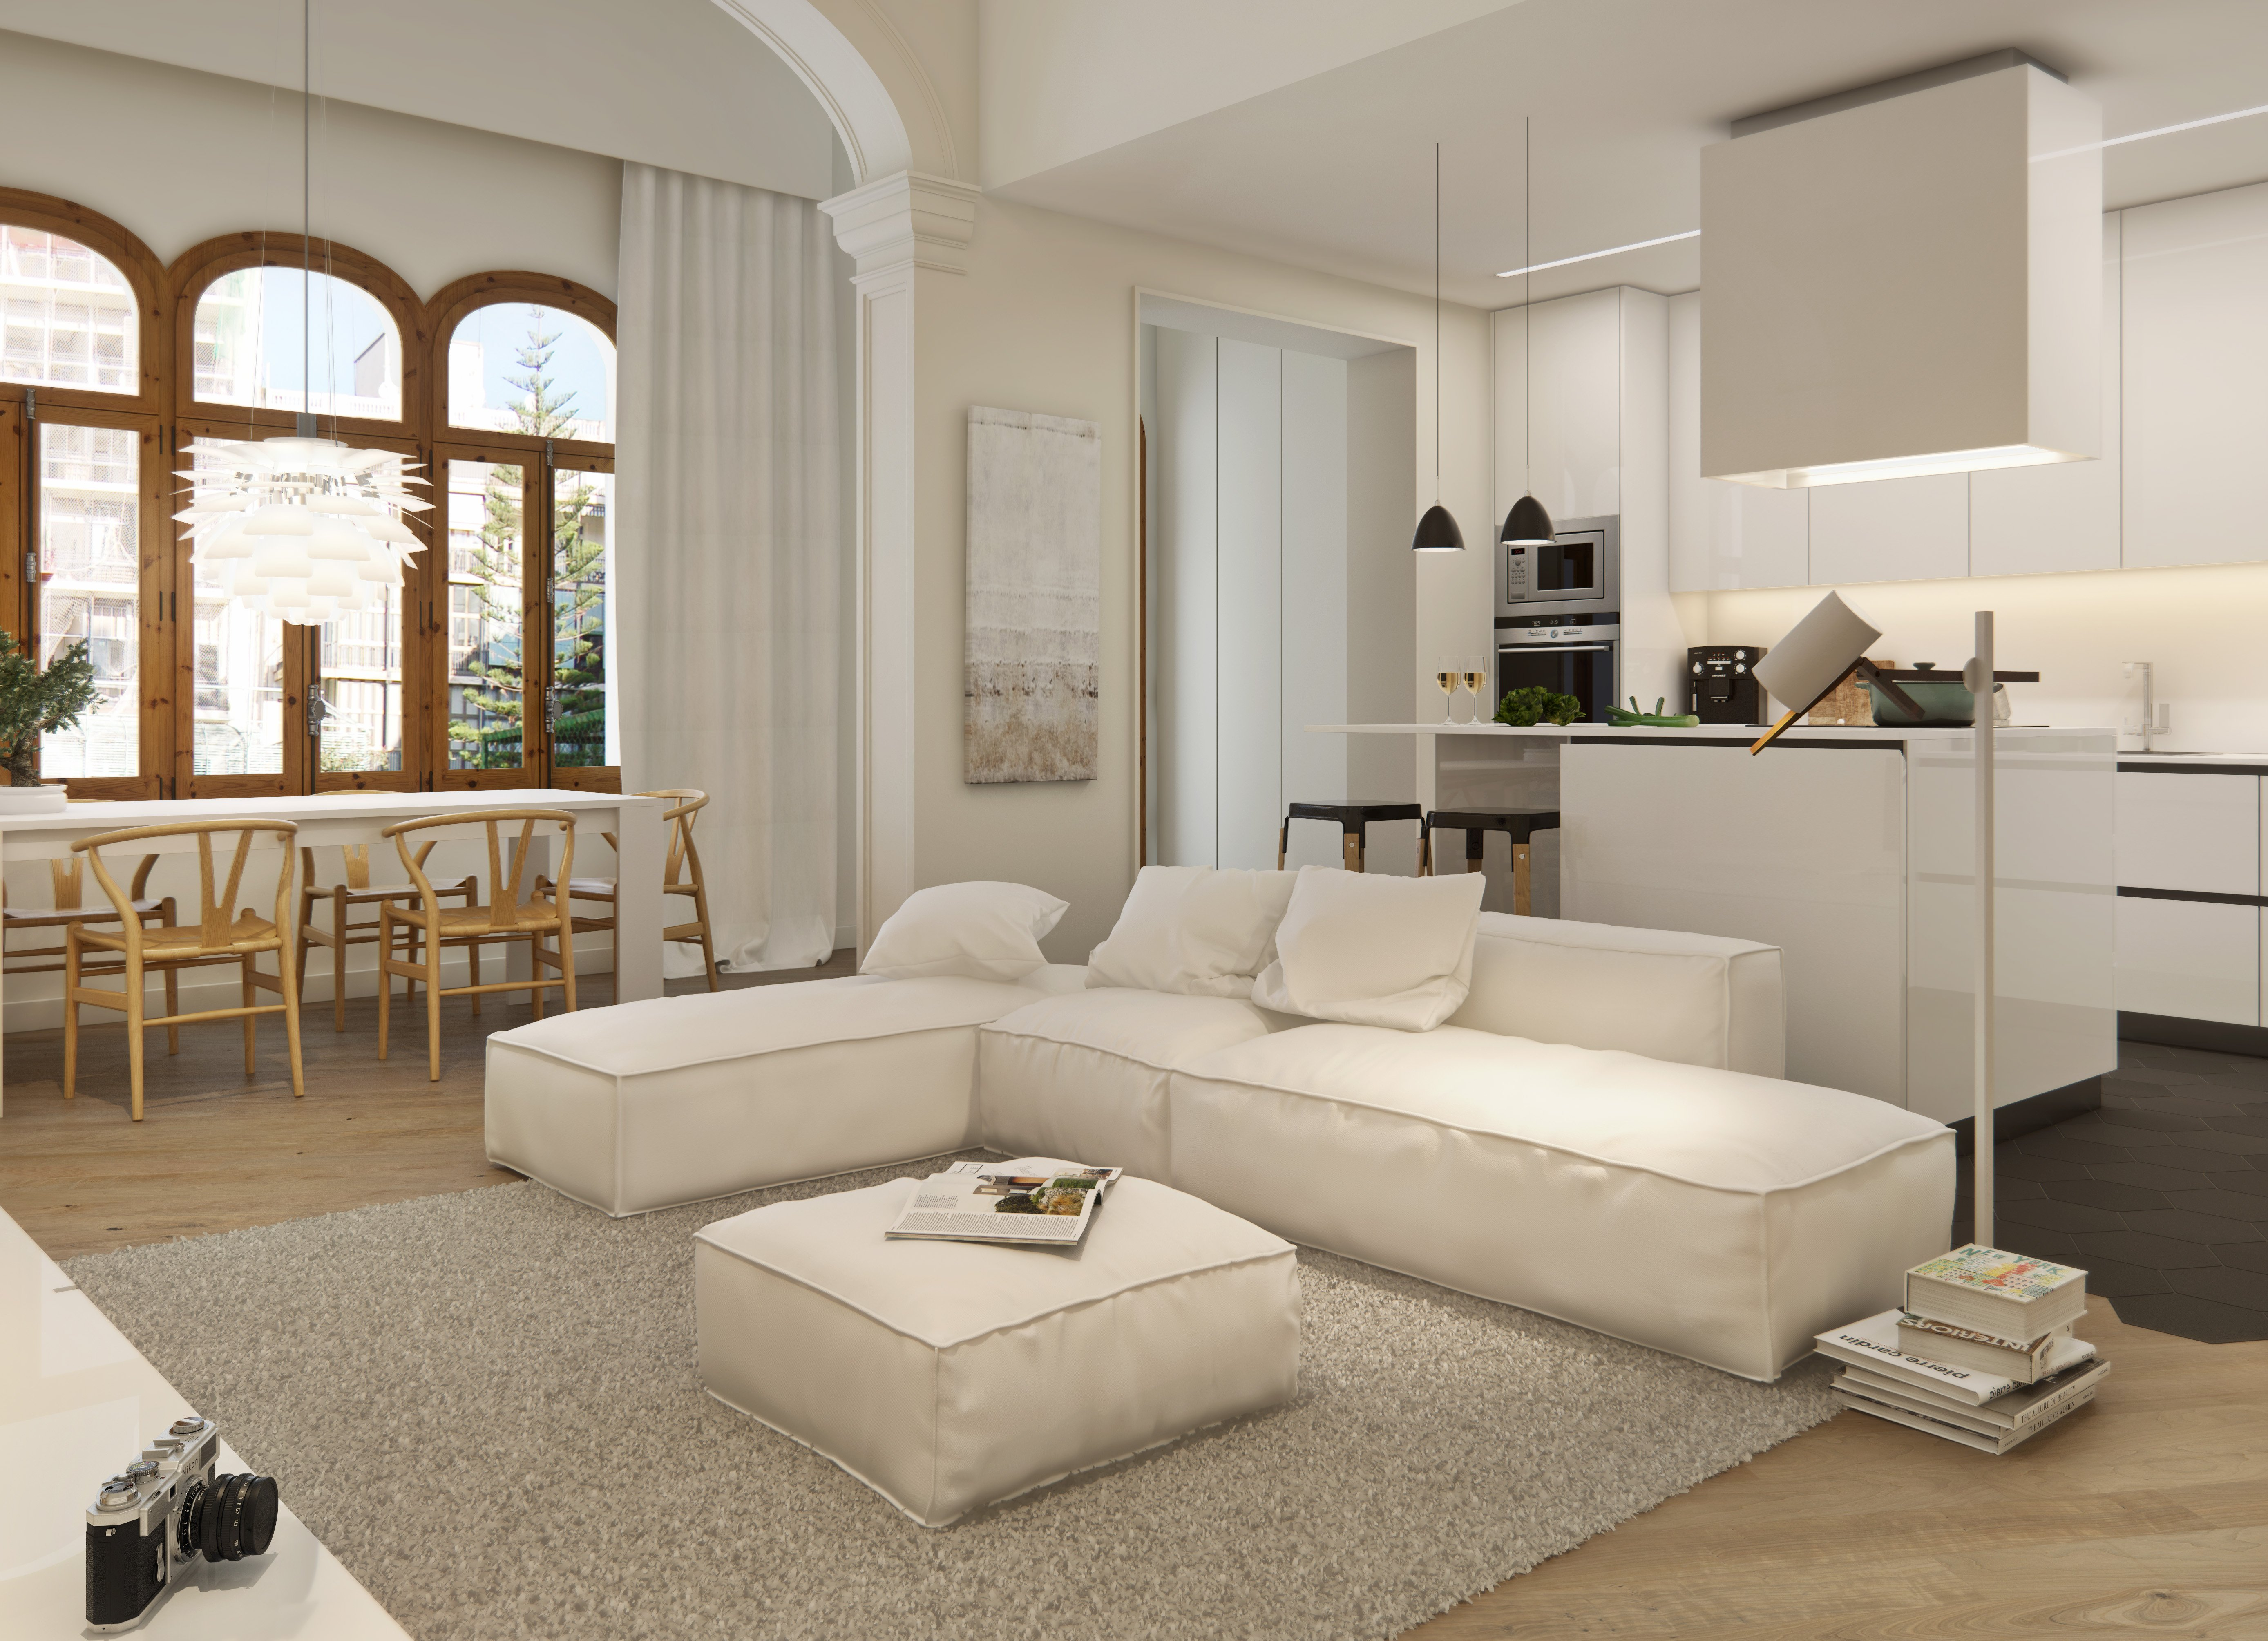 New homes barcelona 20 capital growth predicted lucas fox - New home barcelona ...